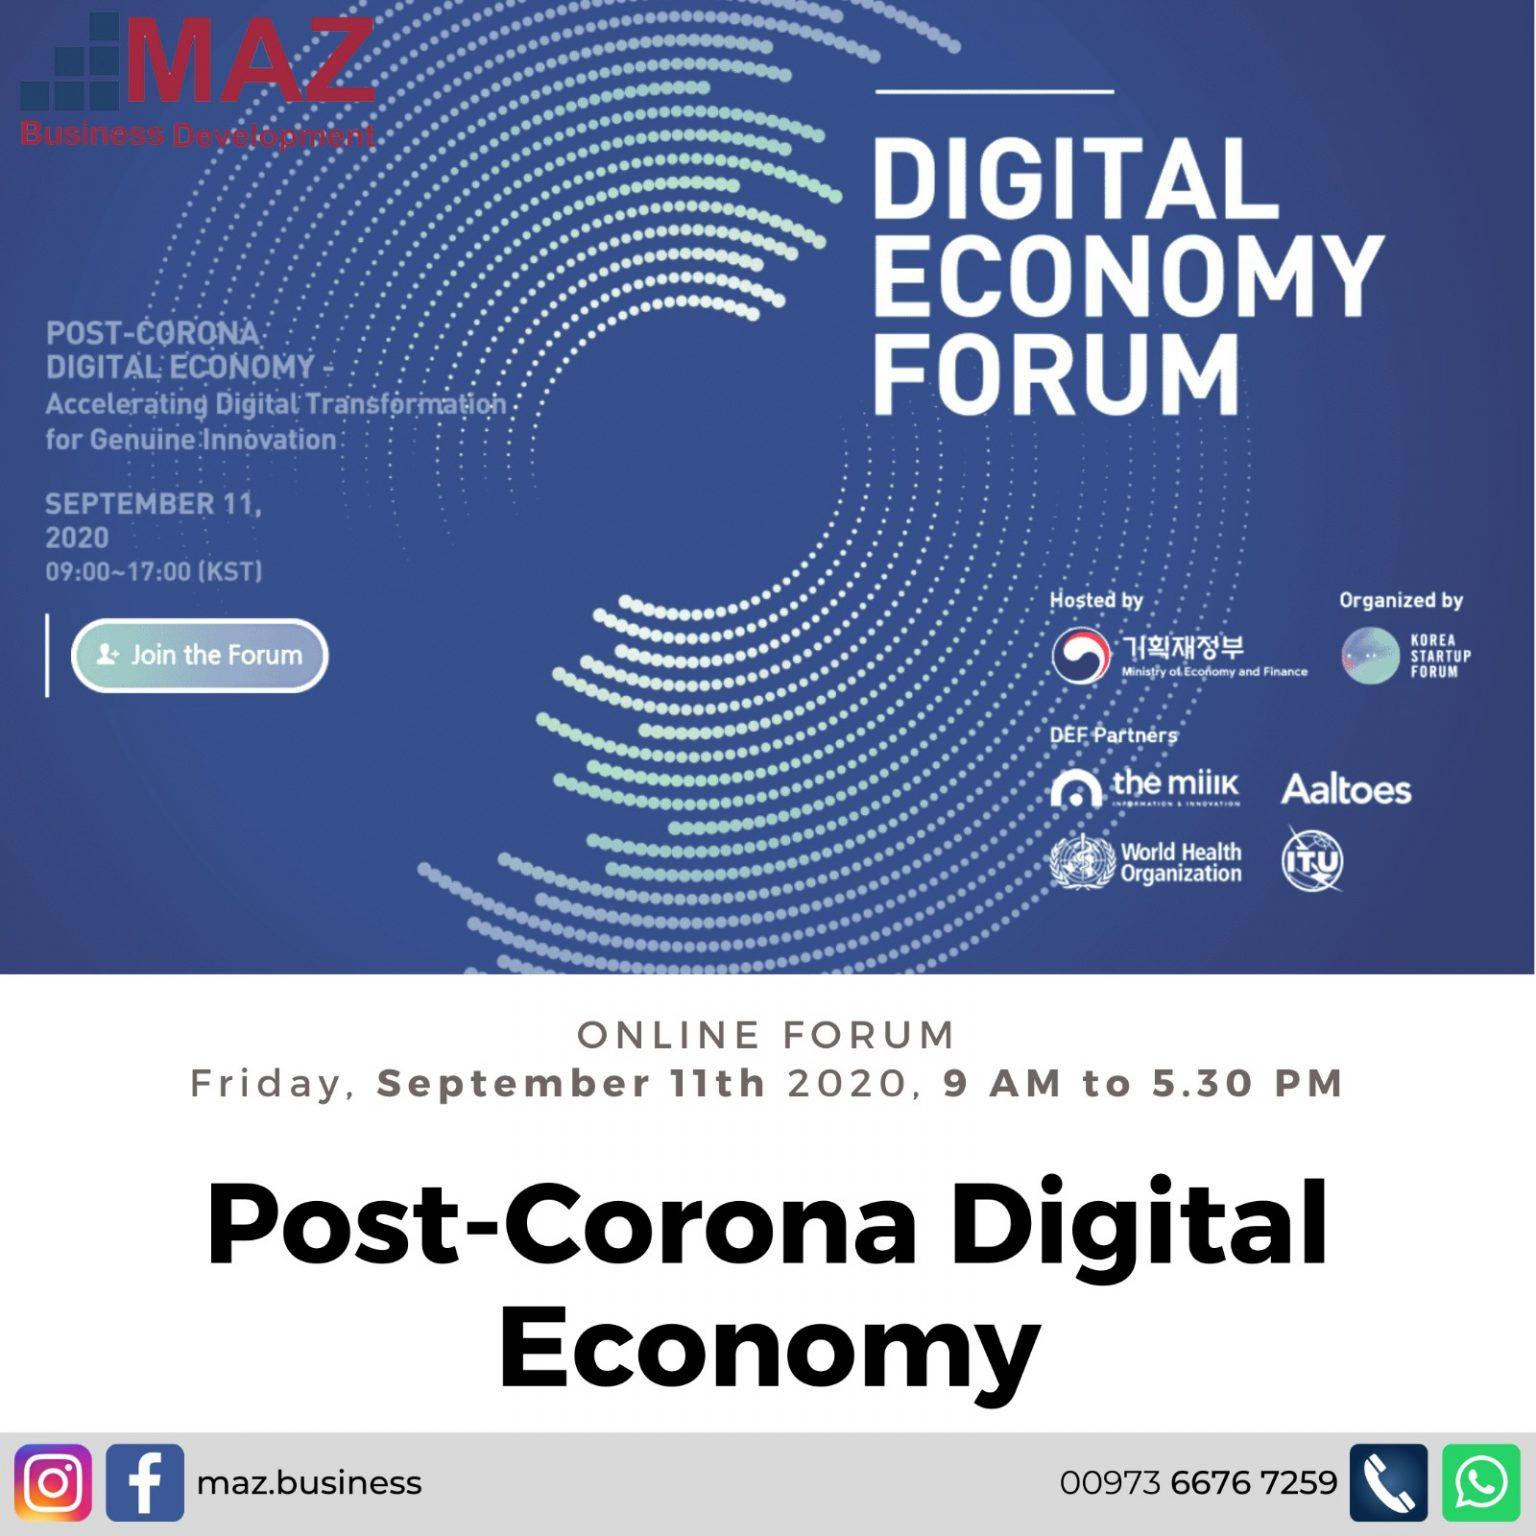 Post-Corona Digital Economy